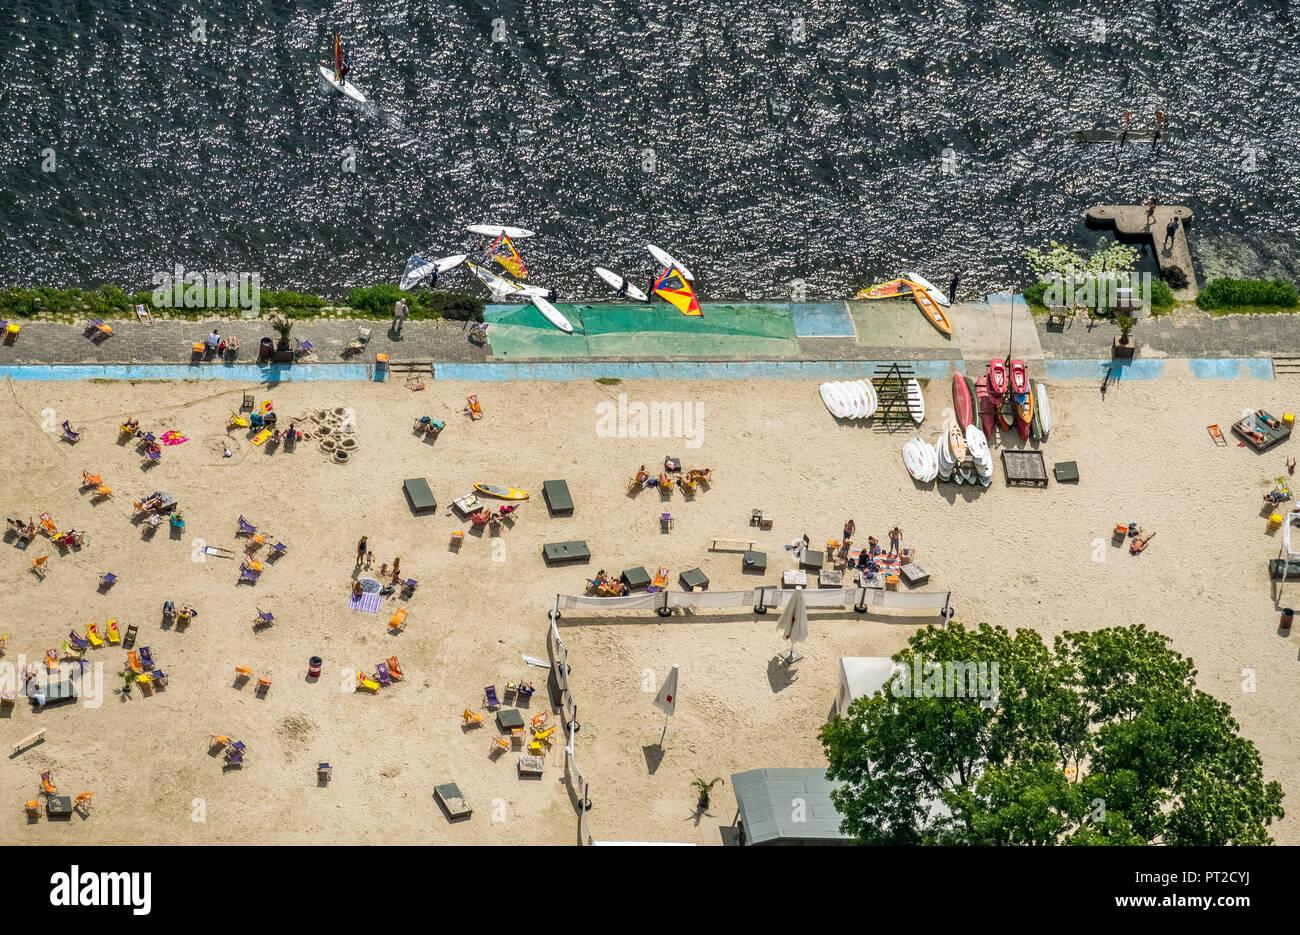 Seaside Beach Baldeney Baignant Dans La Ruhr La Baignade Dans Le Baldeneysee Lido Beach Volley Ball